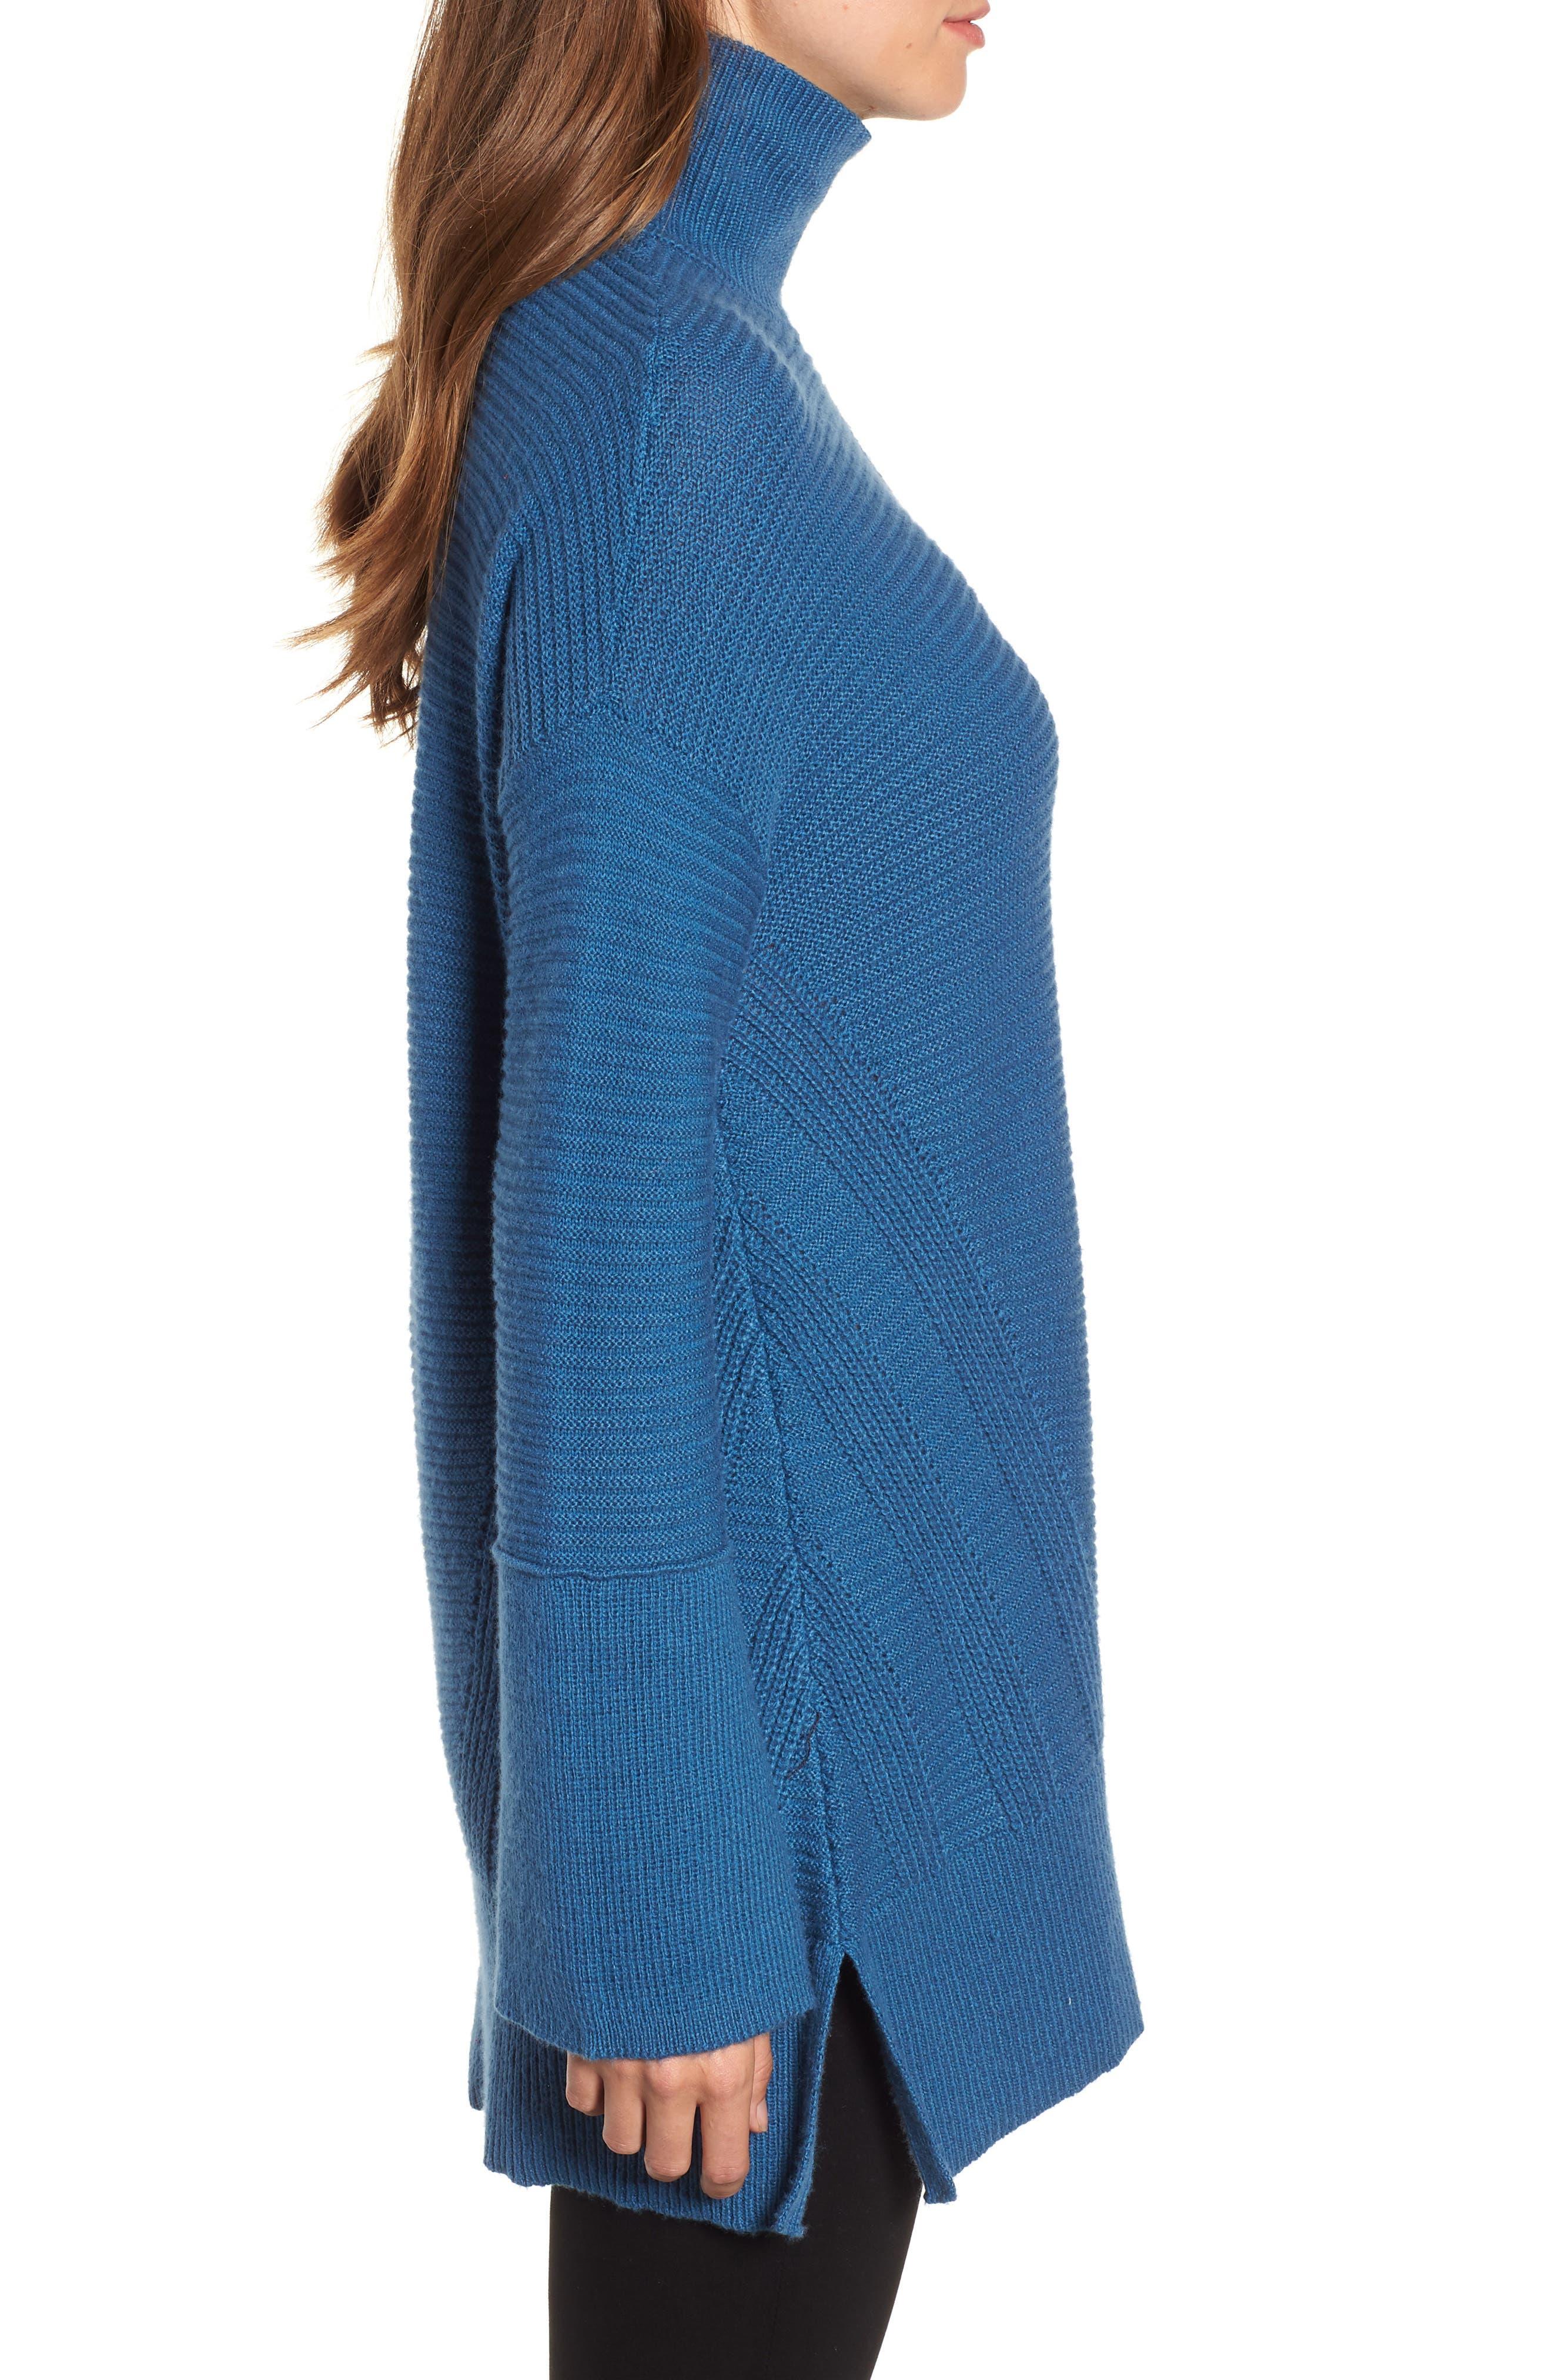 Ribbed Turtleneck Tunic Sweater,                             Alternate thumbnail 3, color,                             BLUE DARK